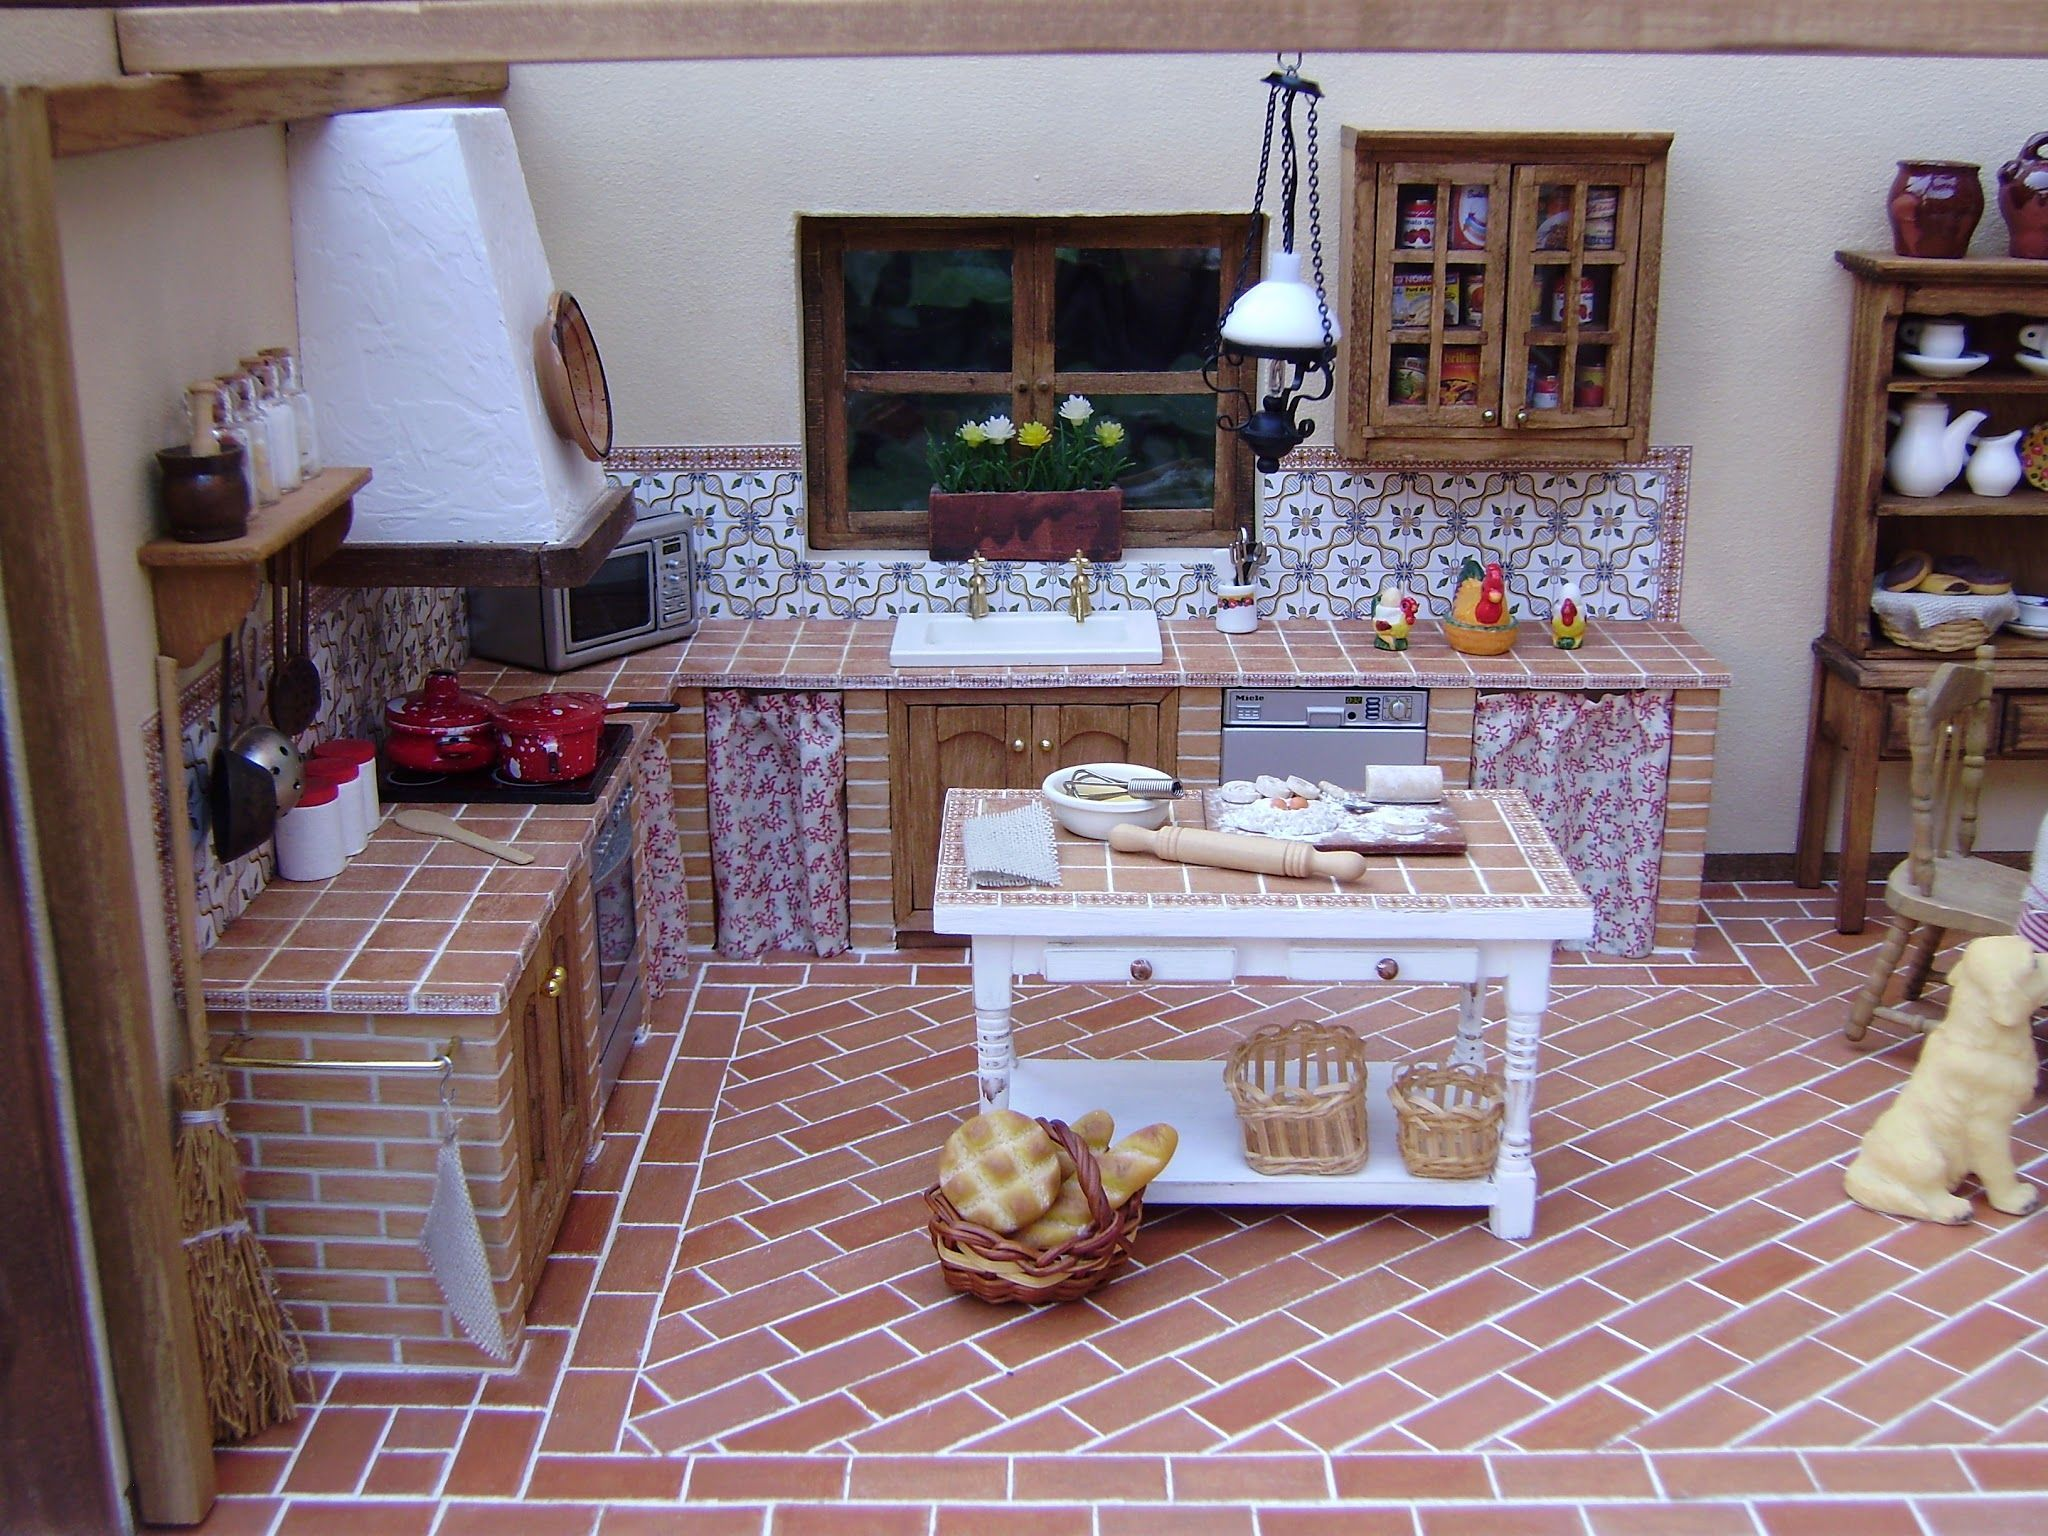 Guglielmelli Muebles - Cortinas De Cocina Rusticas 3 Casas Coloniales Pinterest [mjhdah]https://s-media-cache-ak0.pinimg.com/originals/1b/ce/47/1bce47d616c178882f04a891b9e3664a.jpg